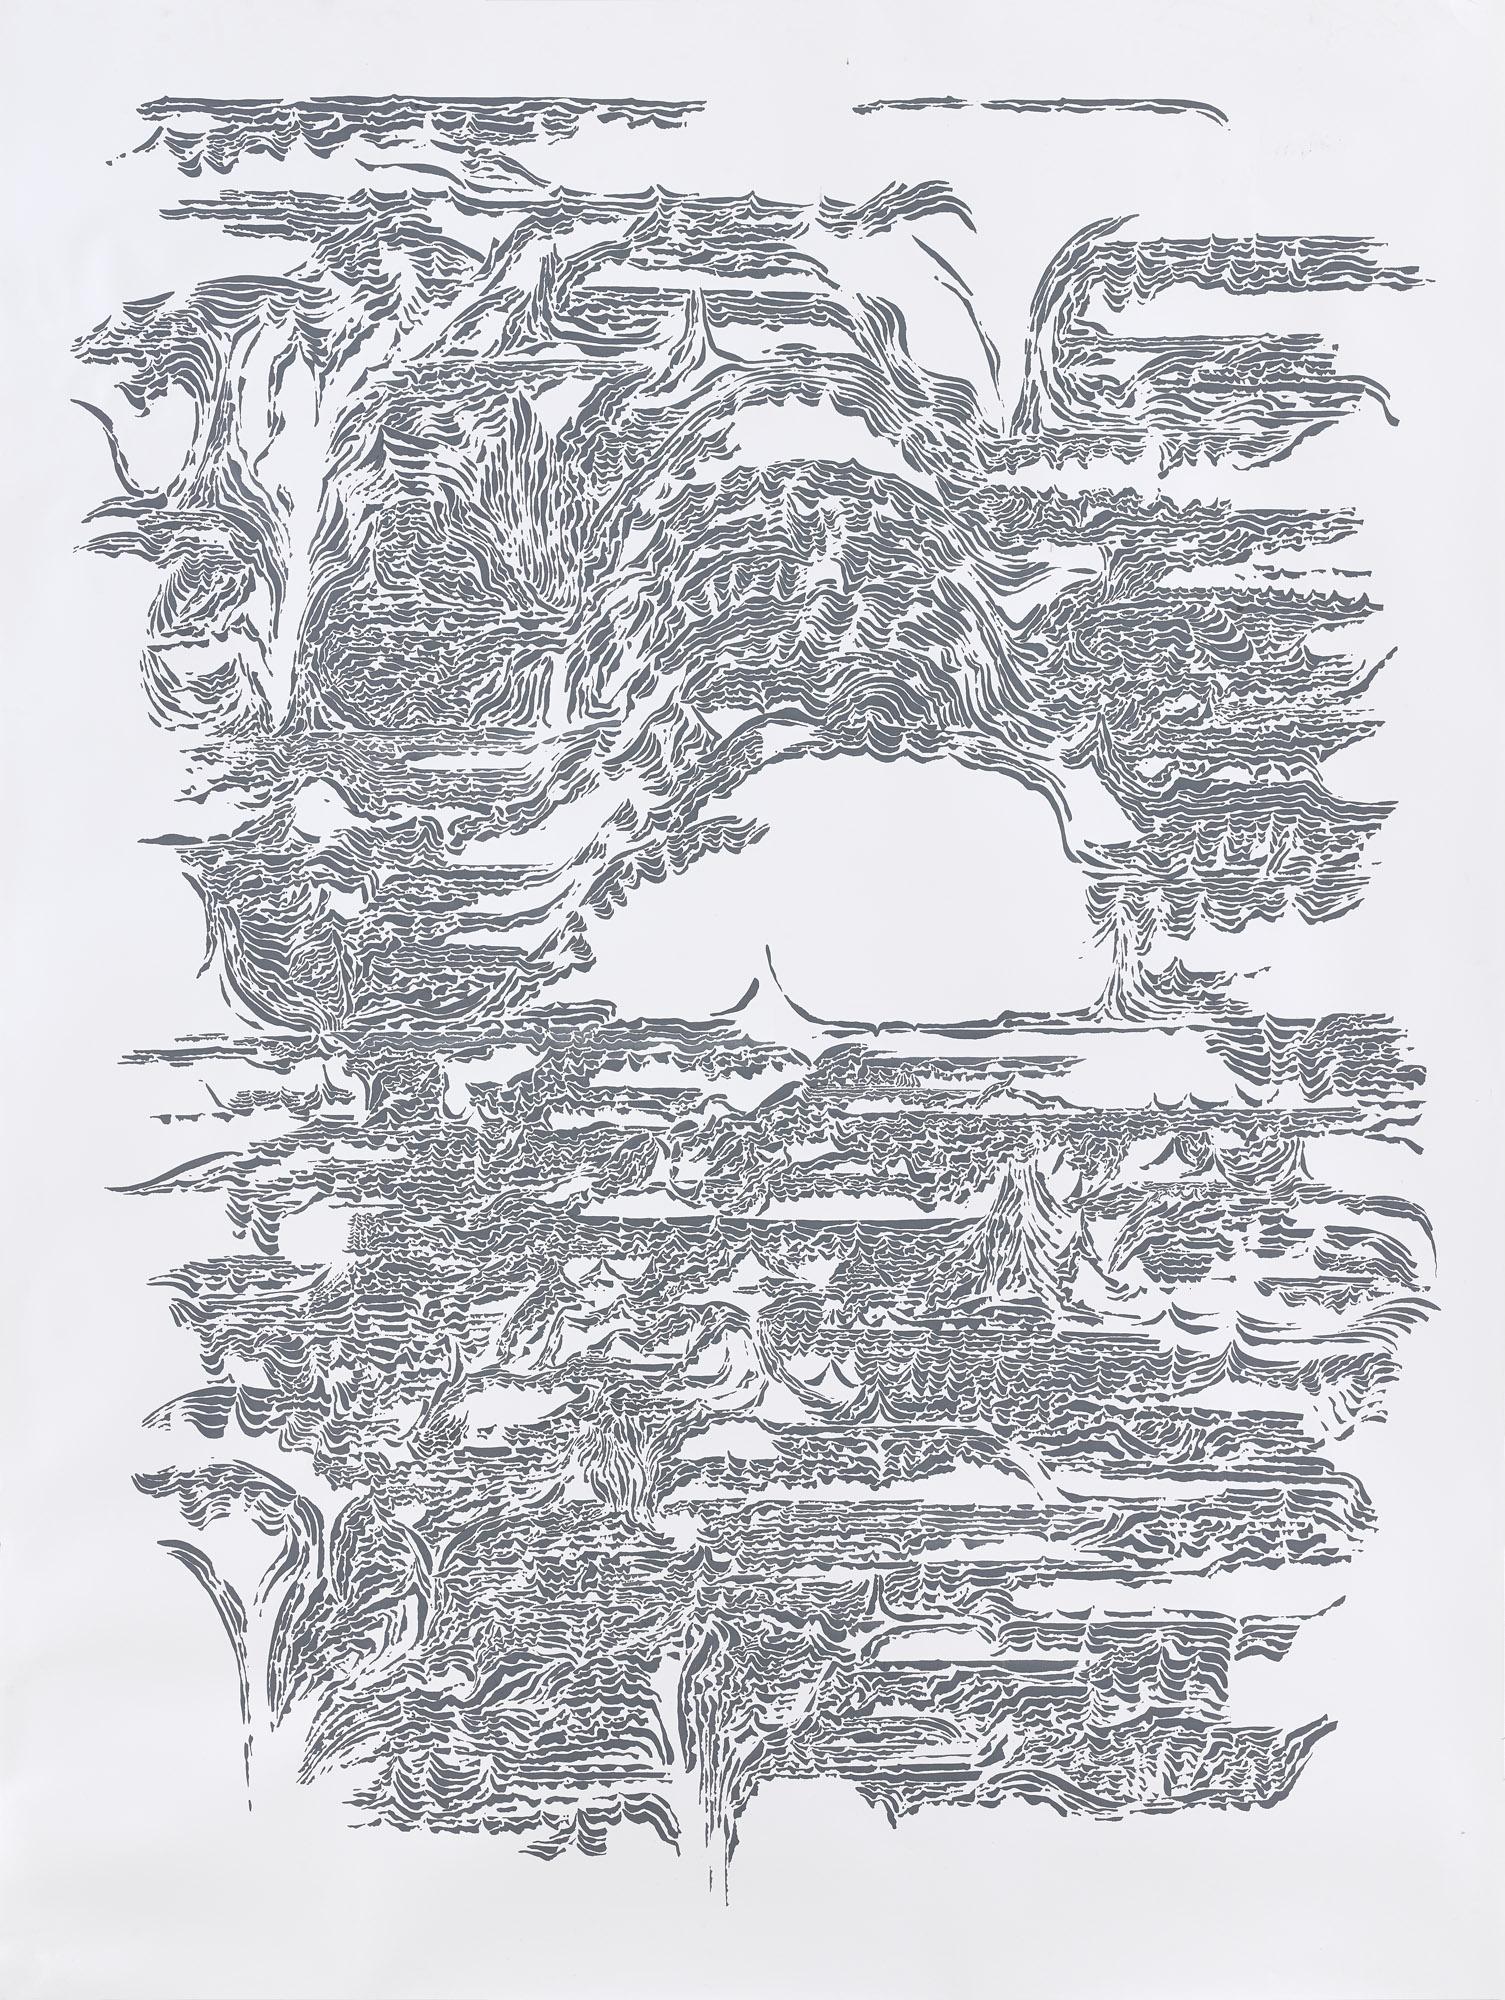 BK P7439 / untitled / ink on paper / 200x150cm / 2015